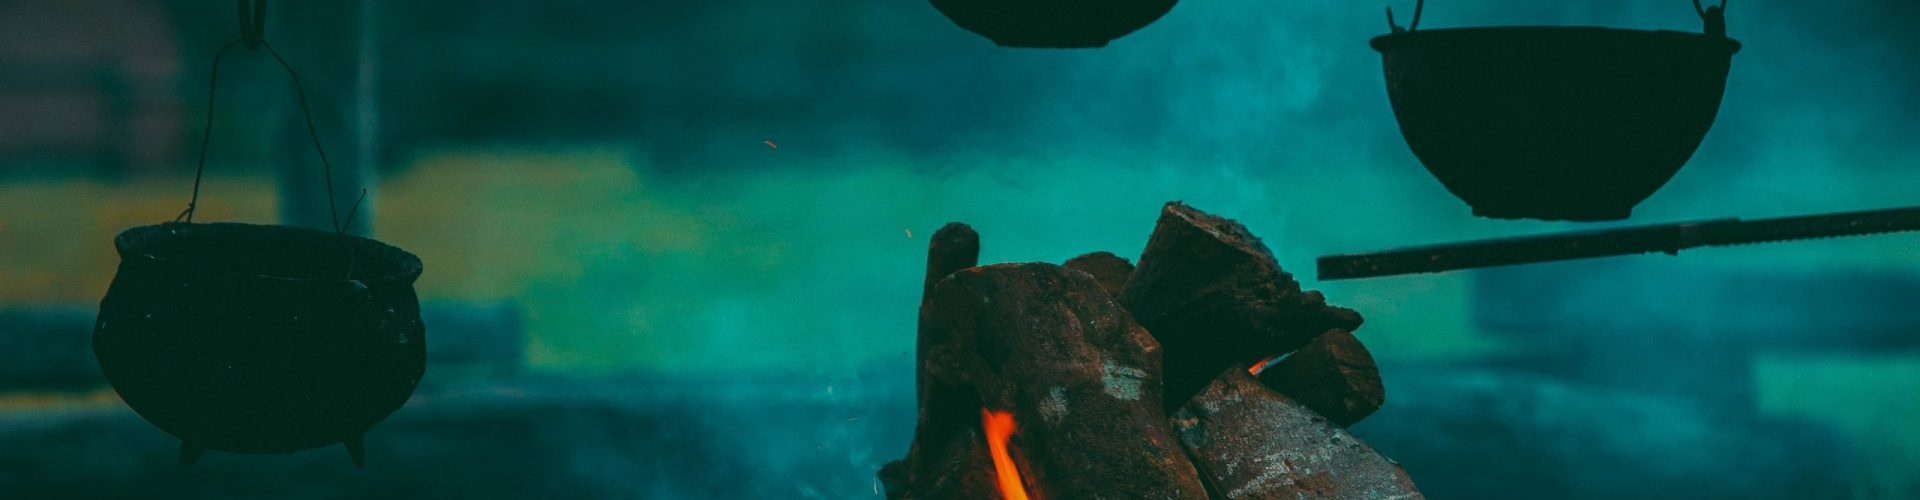 campfire-1846142